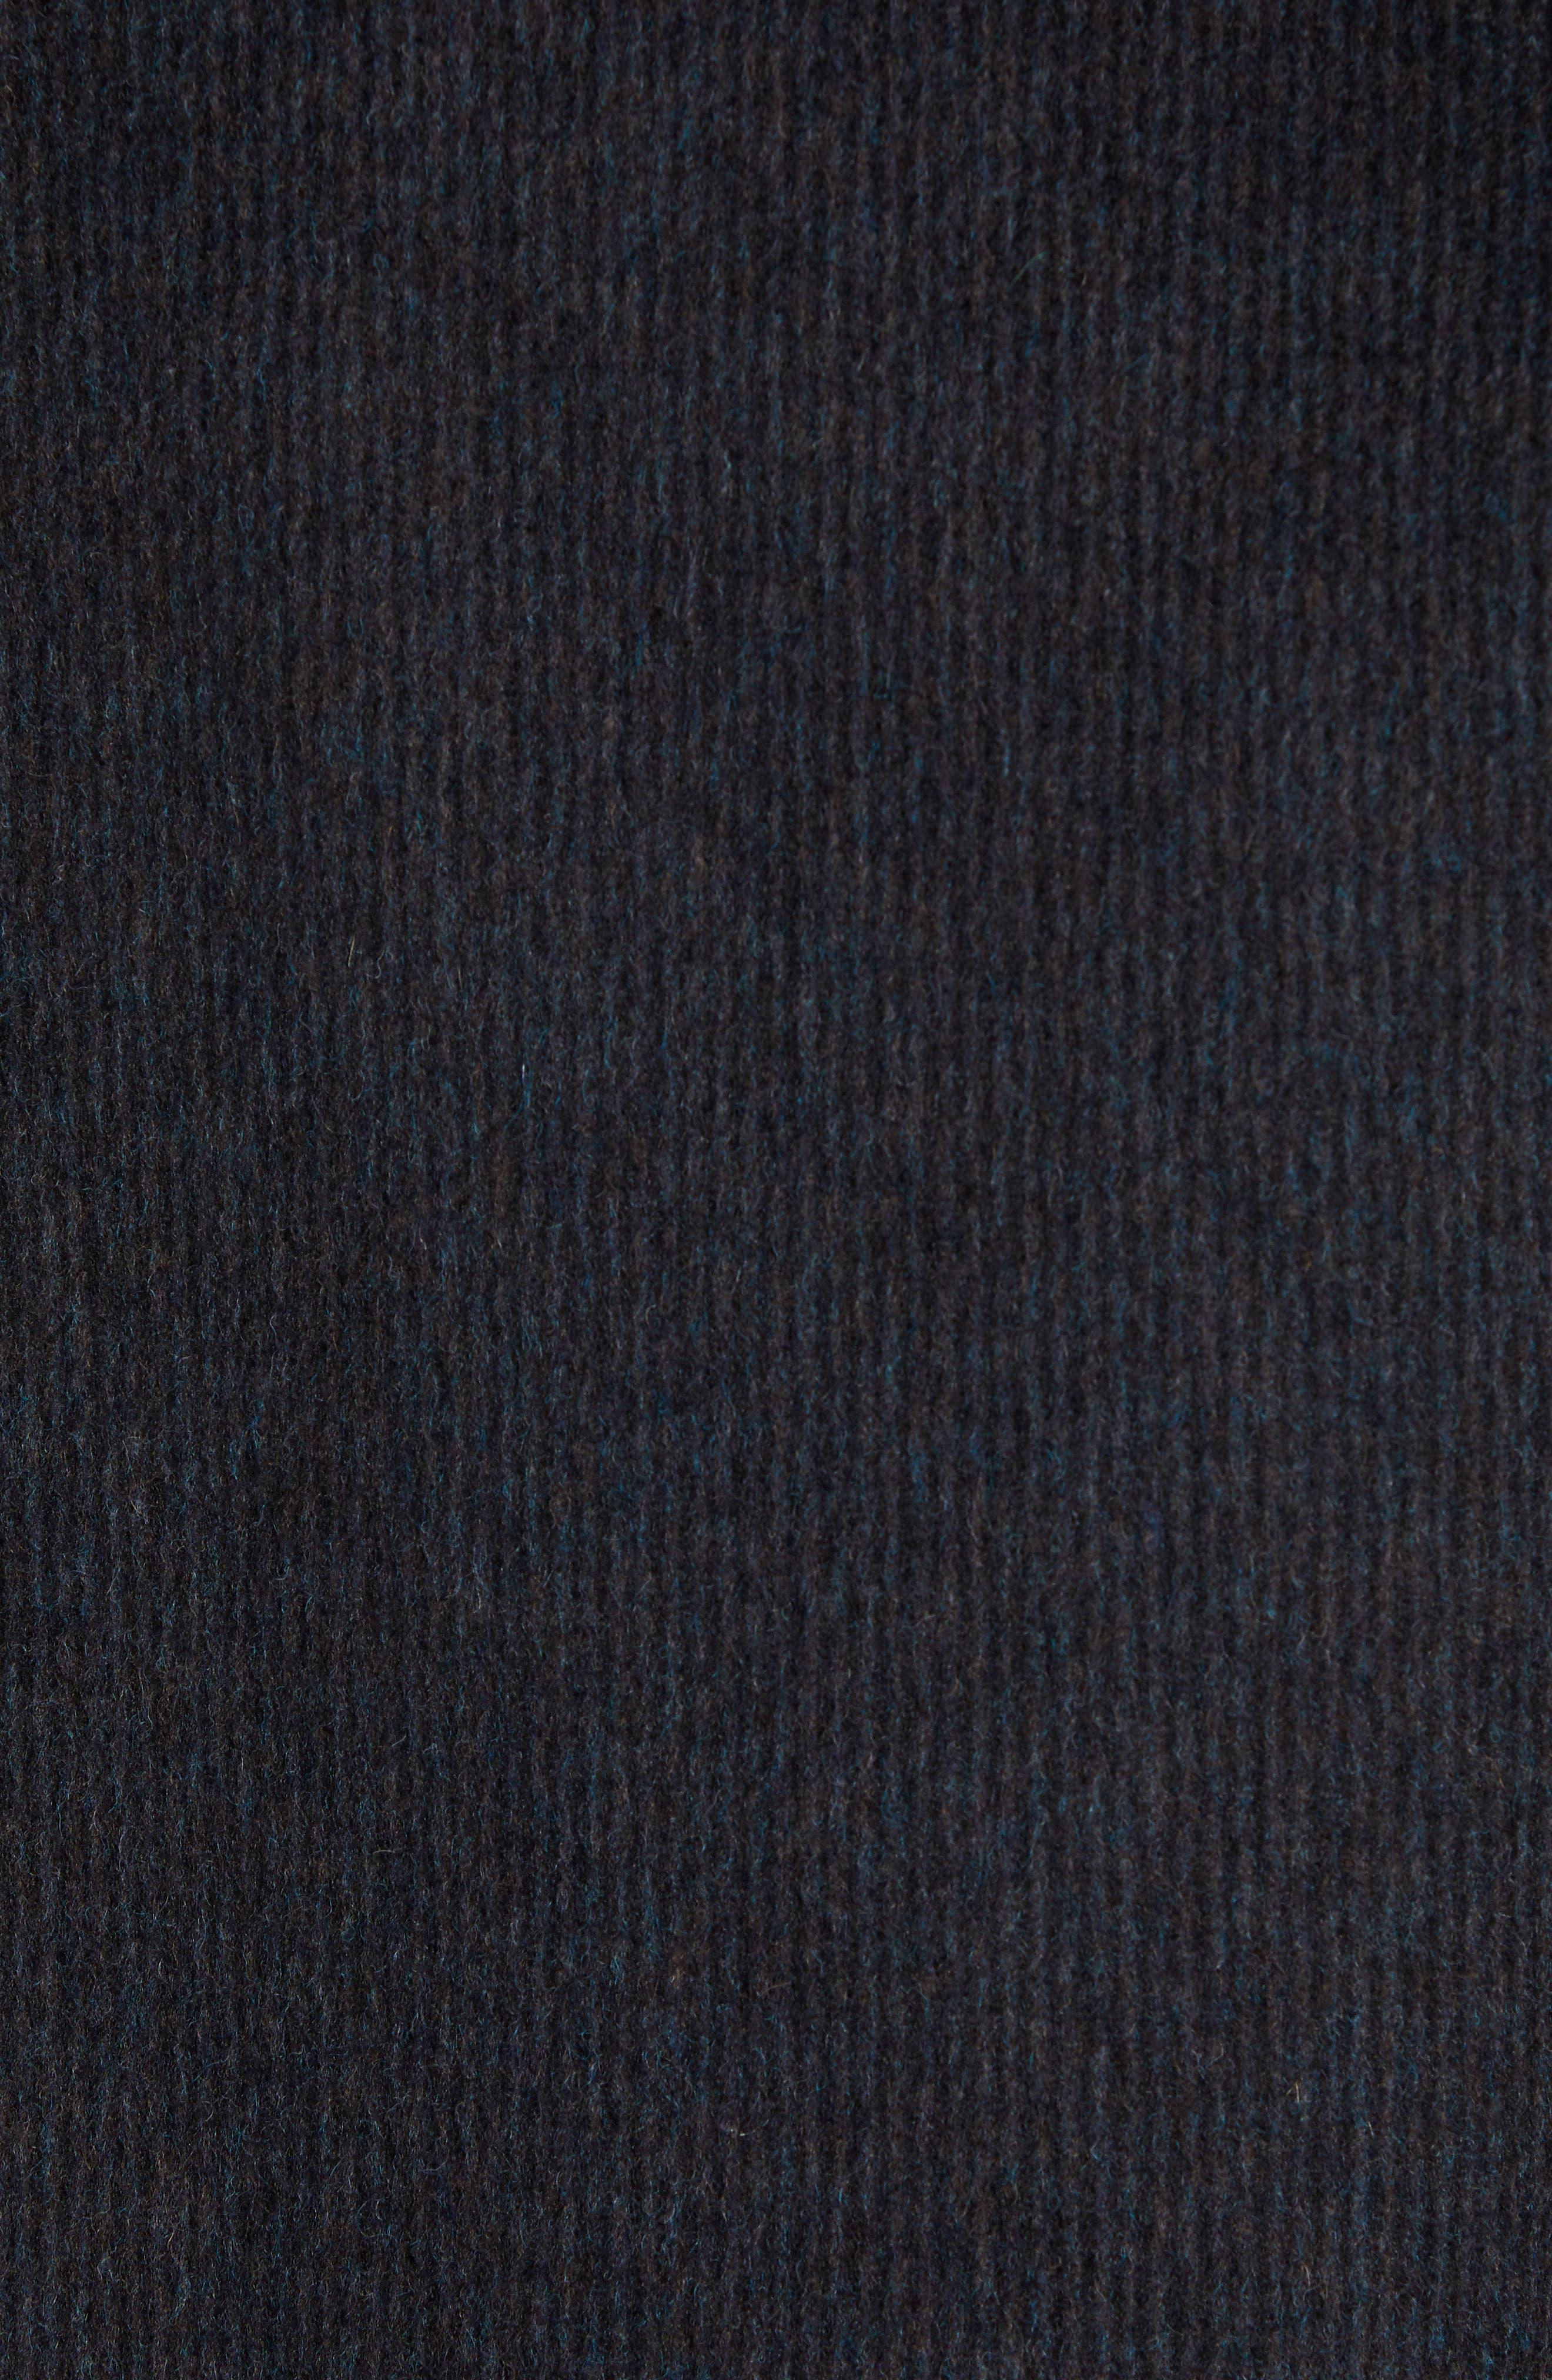 Wool Blend Car Coat,                             Alternate thumbnail 6, color,                             062